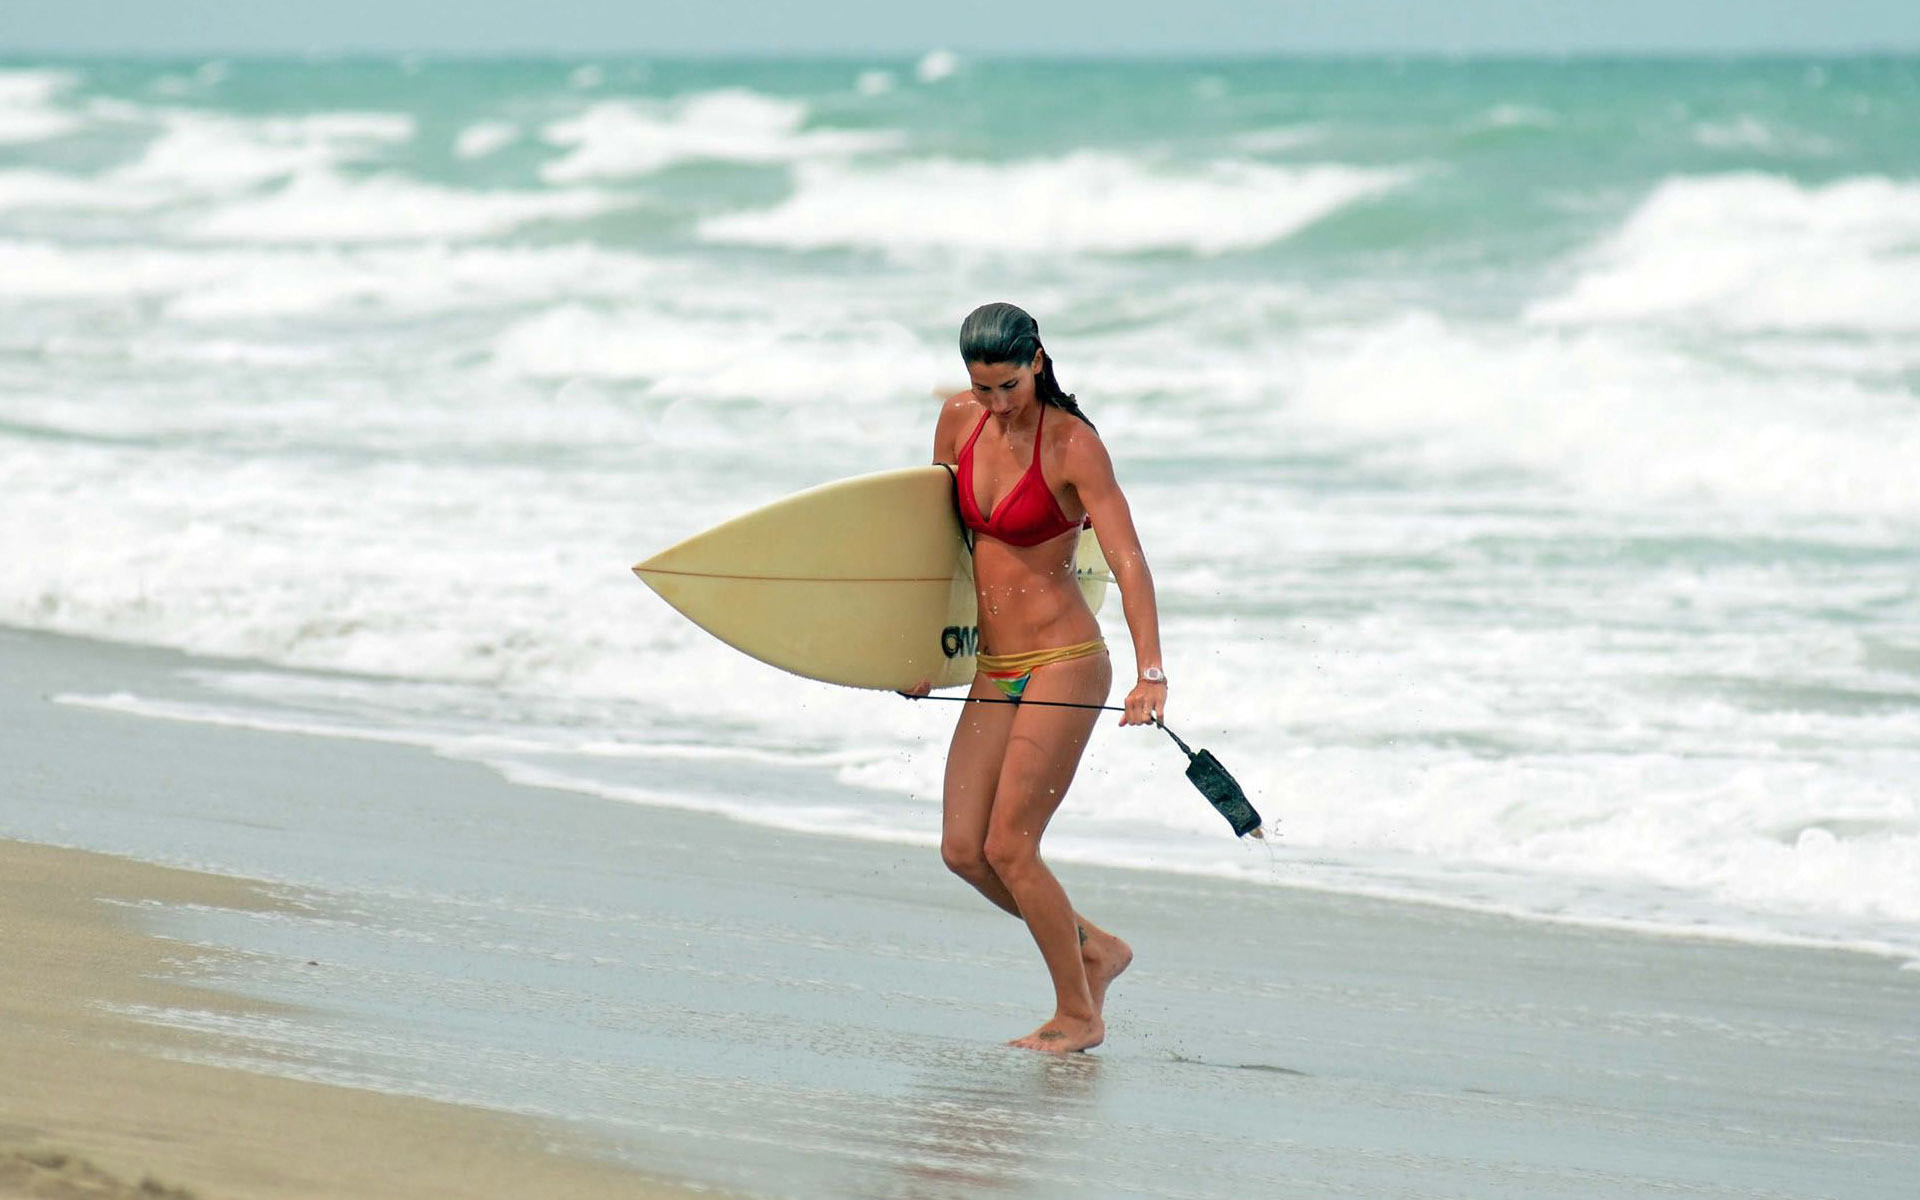 Res: 1920x1200, Surfer girl HD Wallpaper 1920x1080 Surfer girl HD Wallpaper